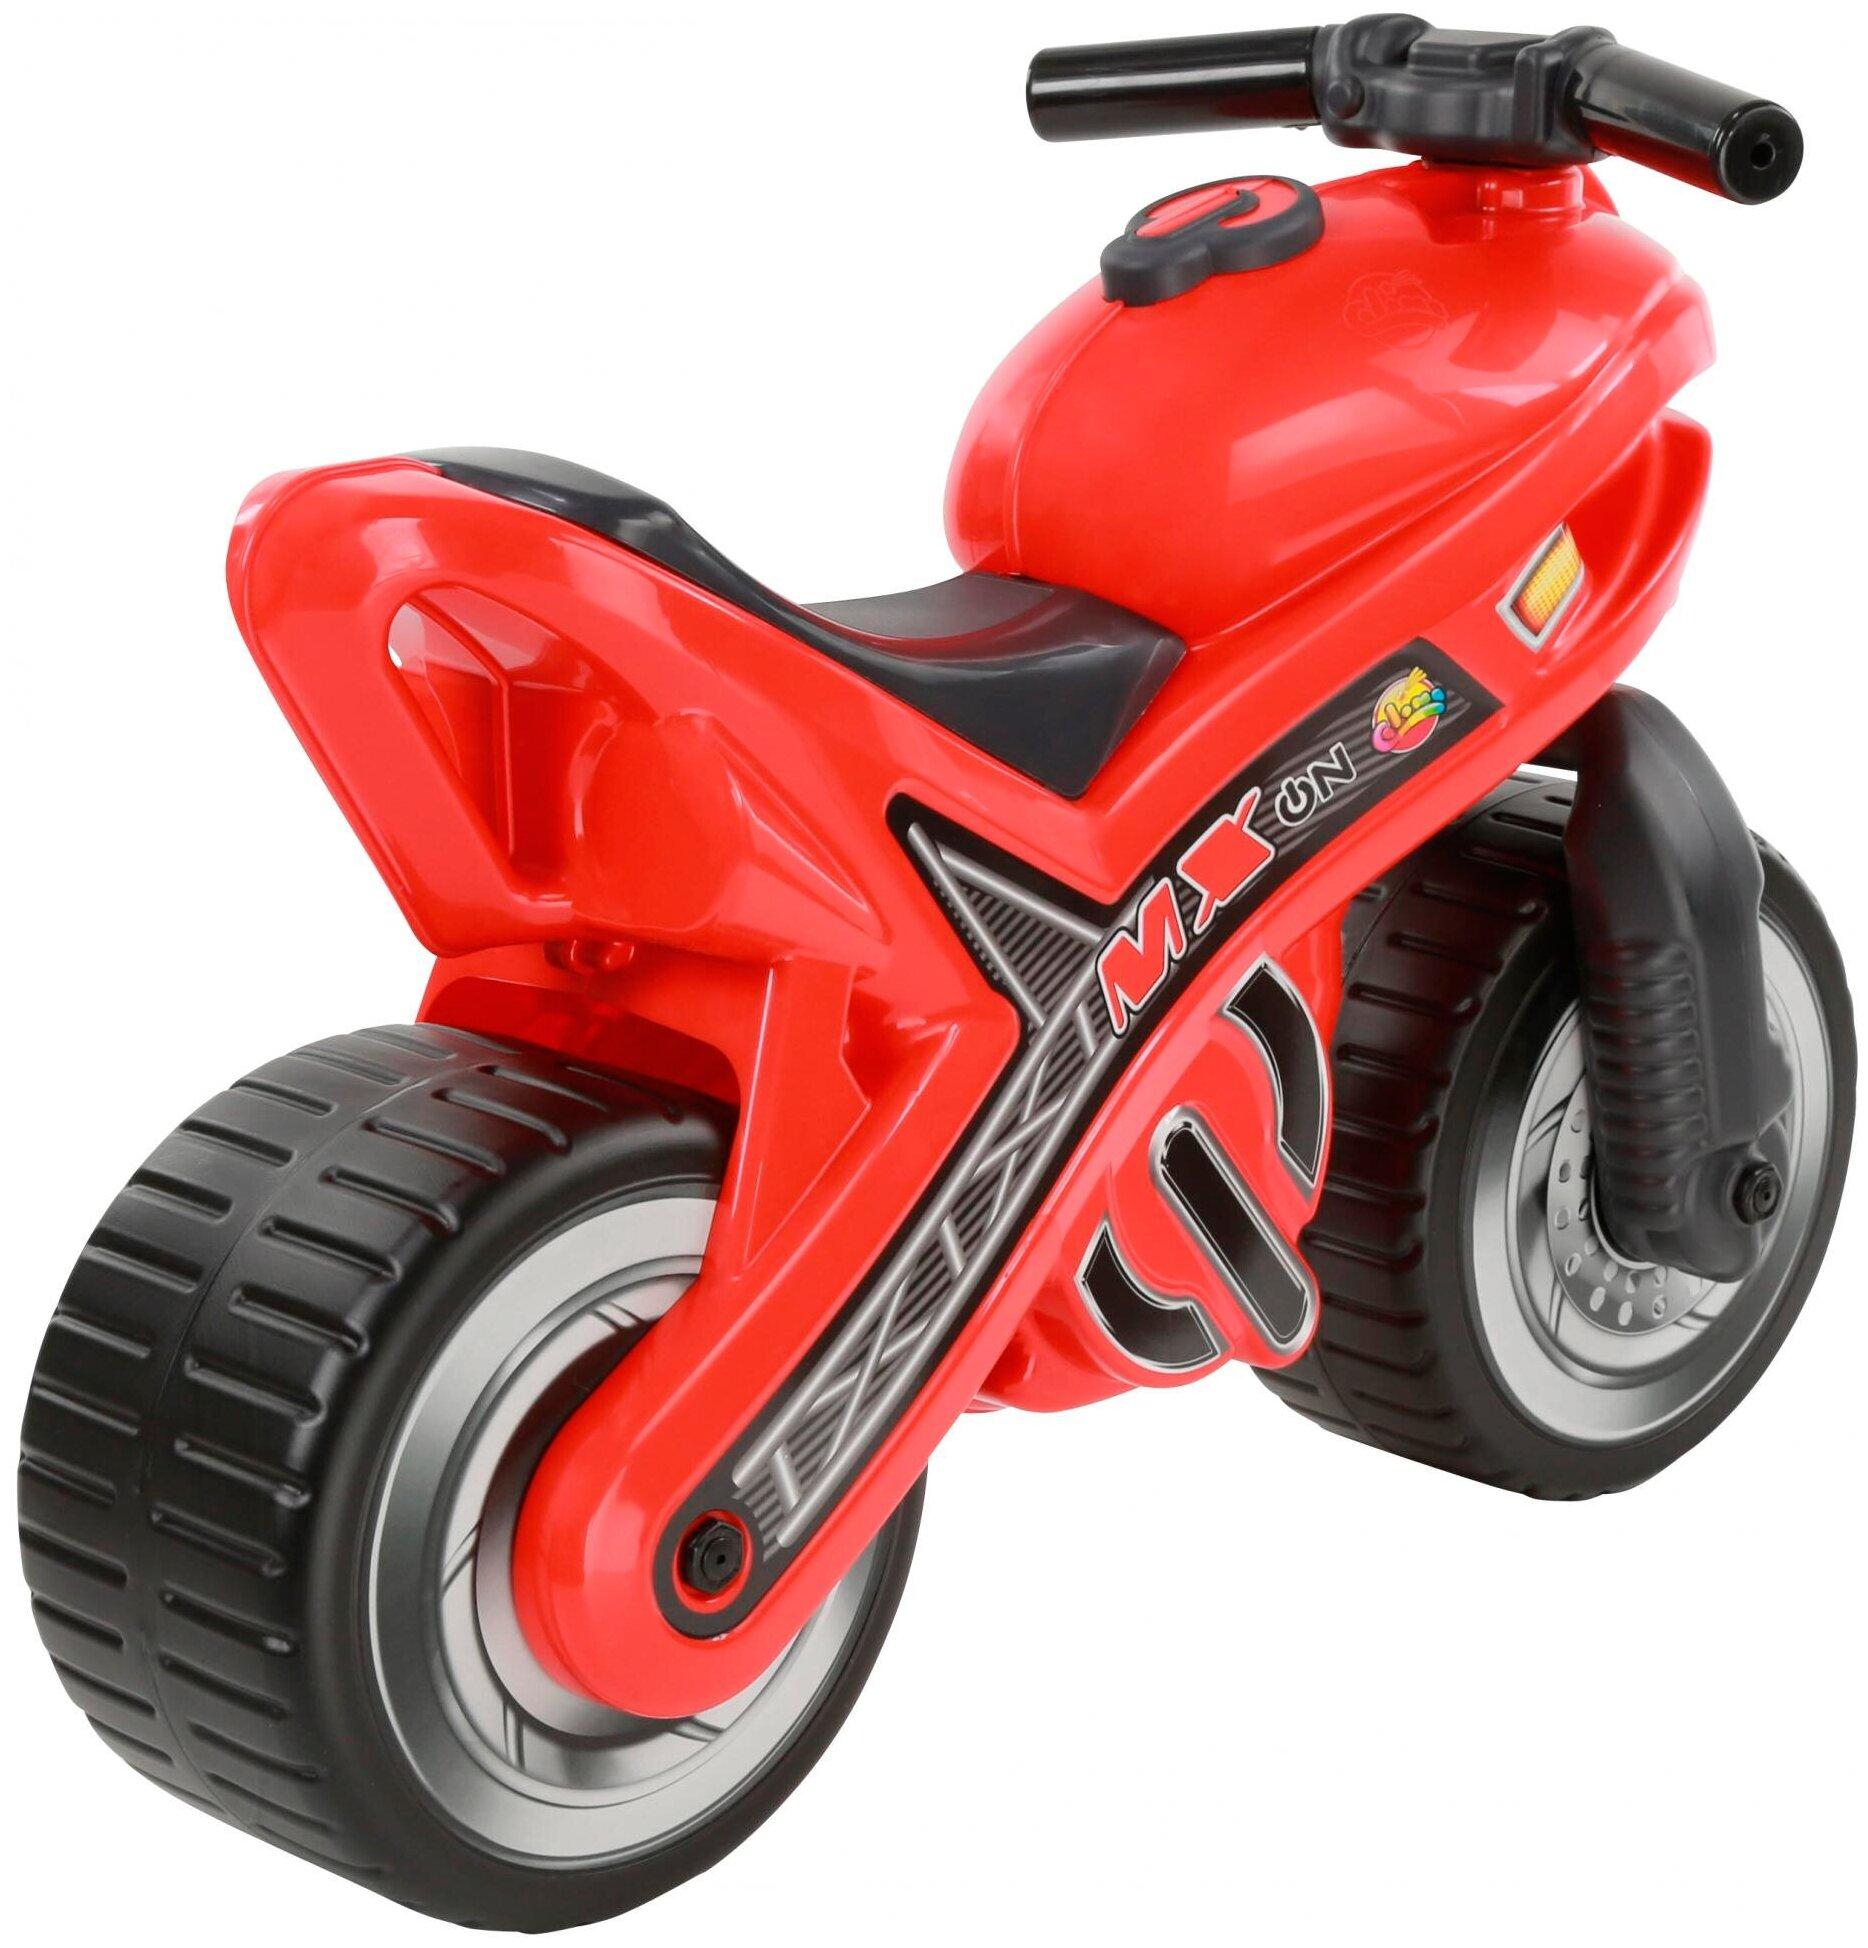 Полесье Мотоцикл МХ - материал: пластик